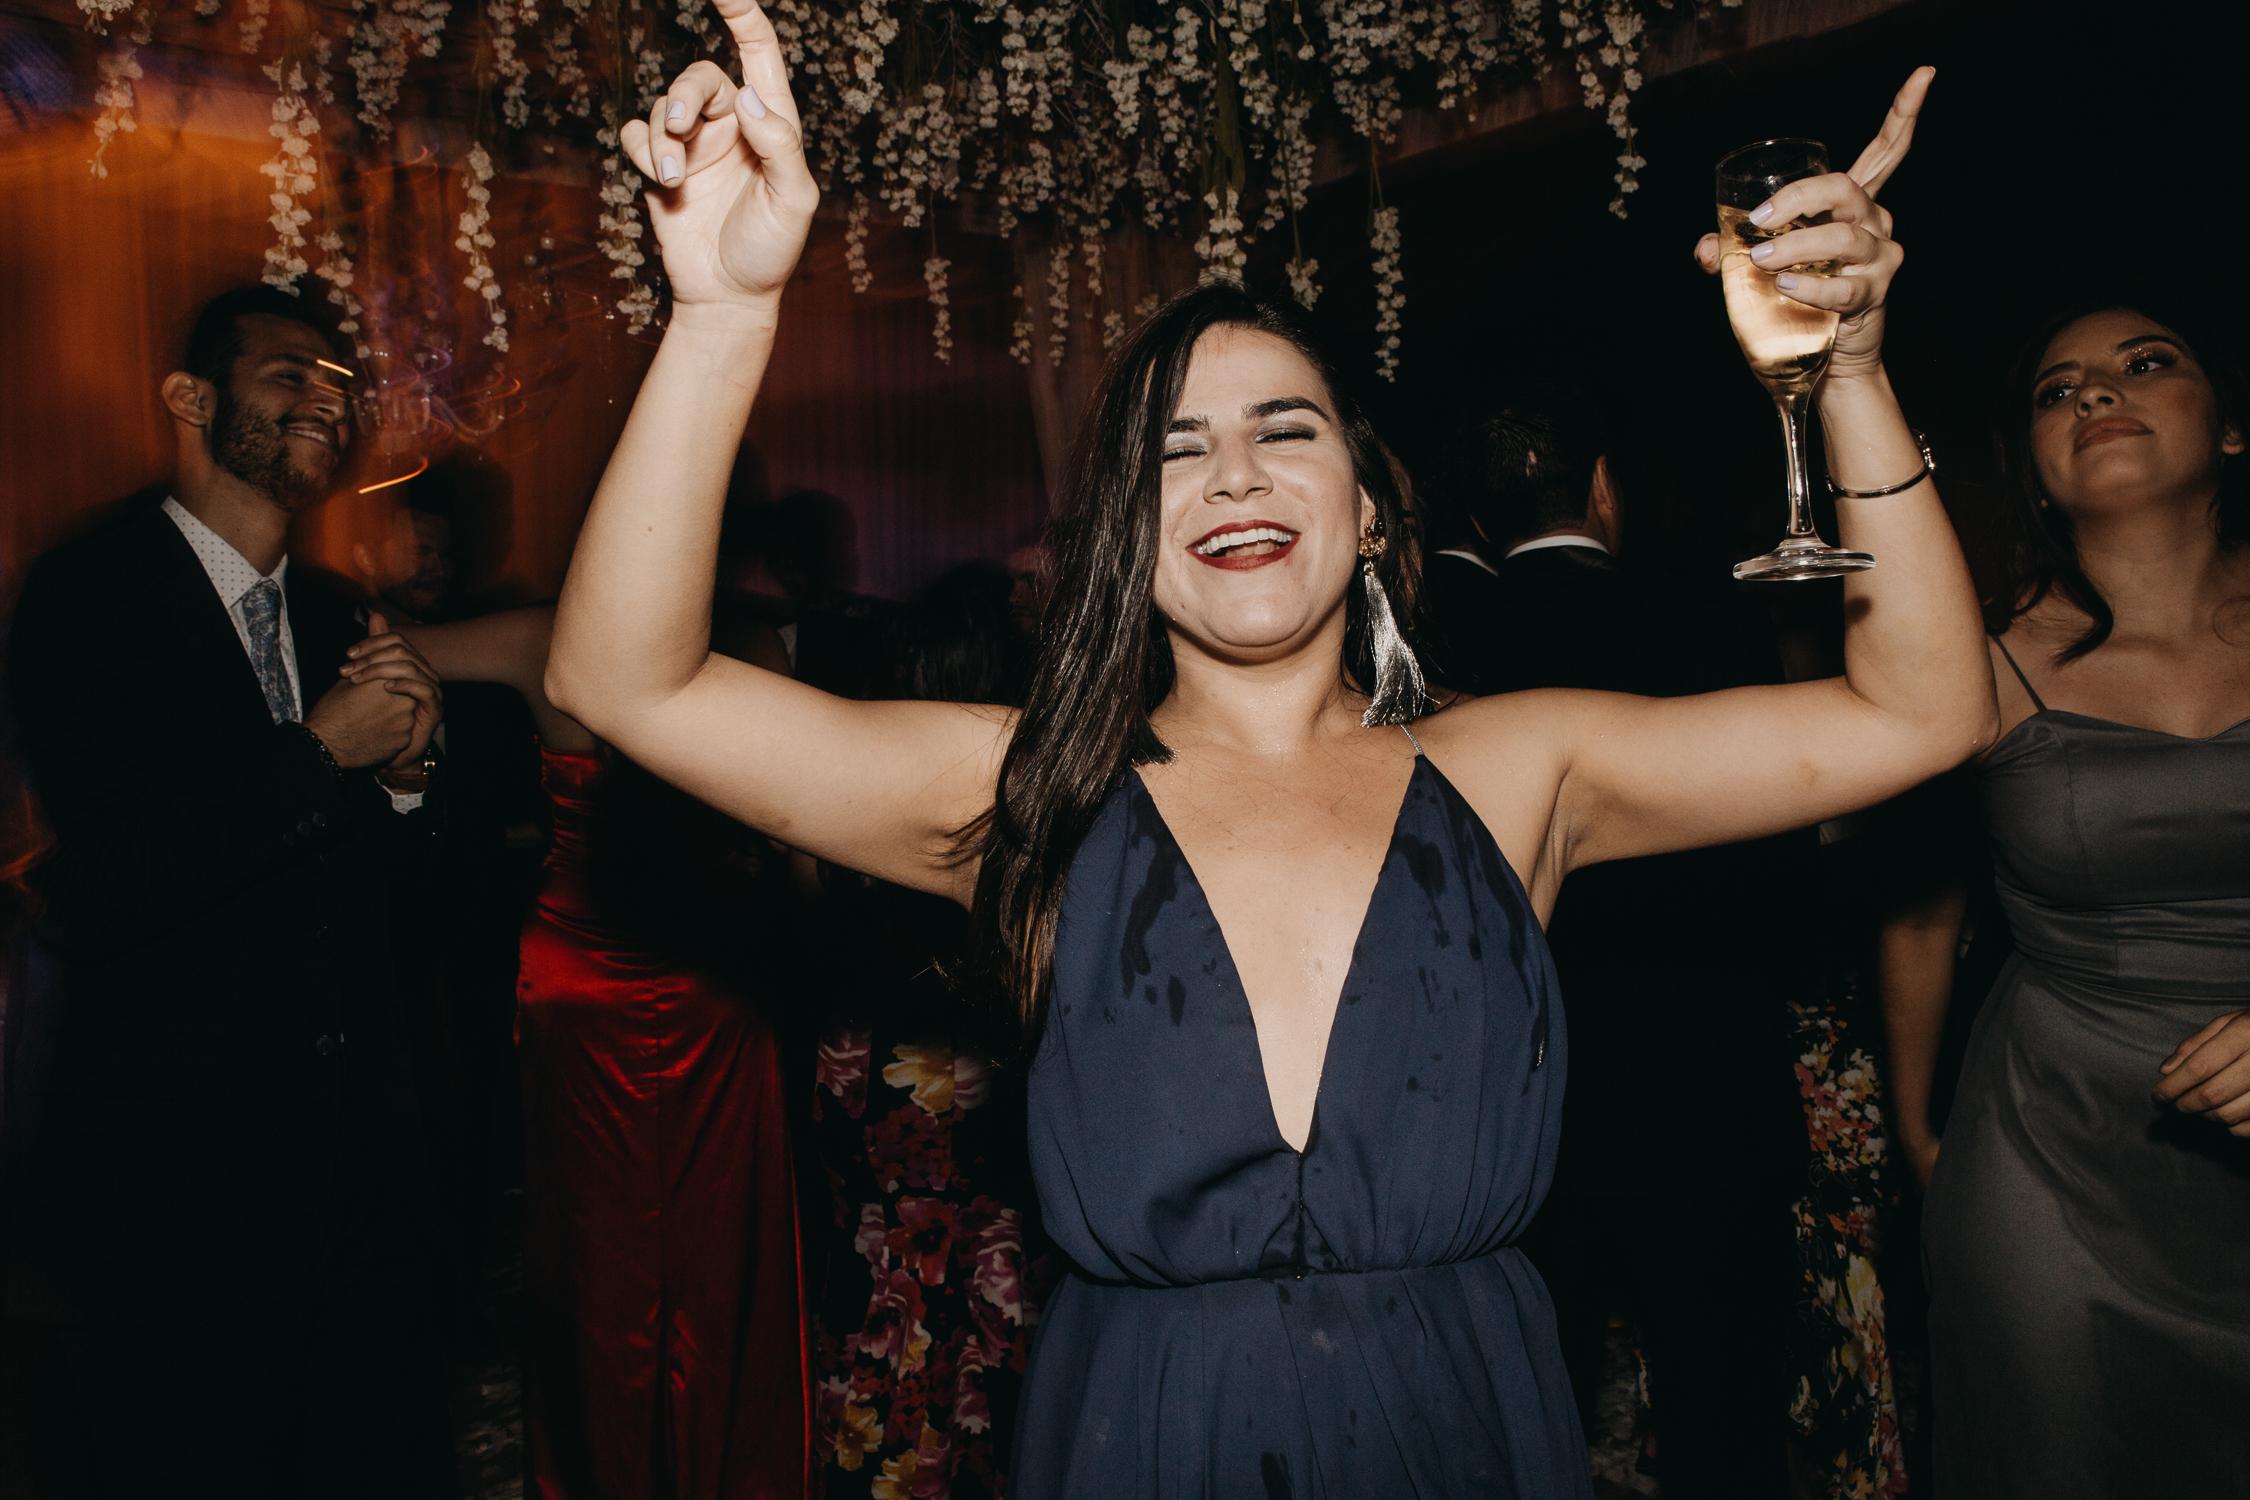 Michelle-Agurto-Fotografia-Bodas-Ecuador-Destination-Wedding-Photographer-Vicky-Javier-286.JPG